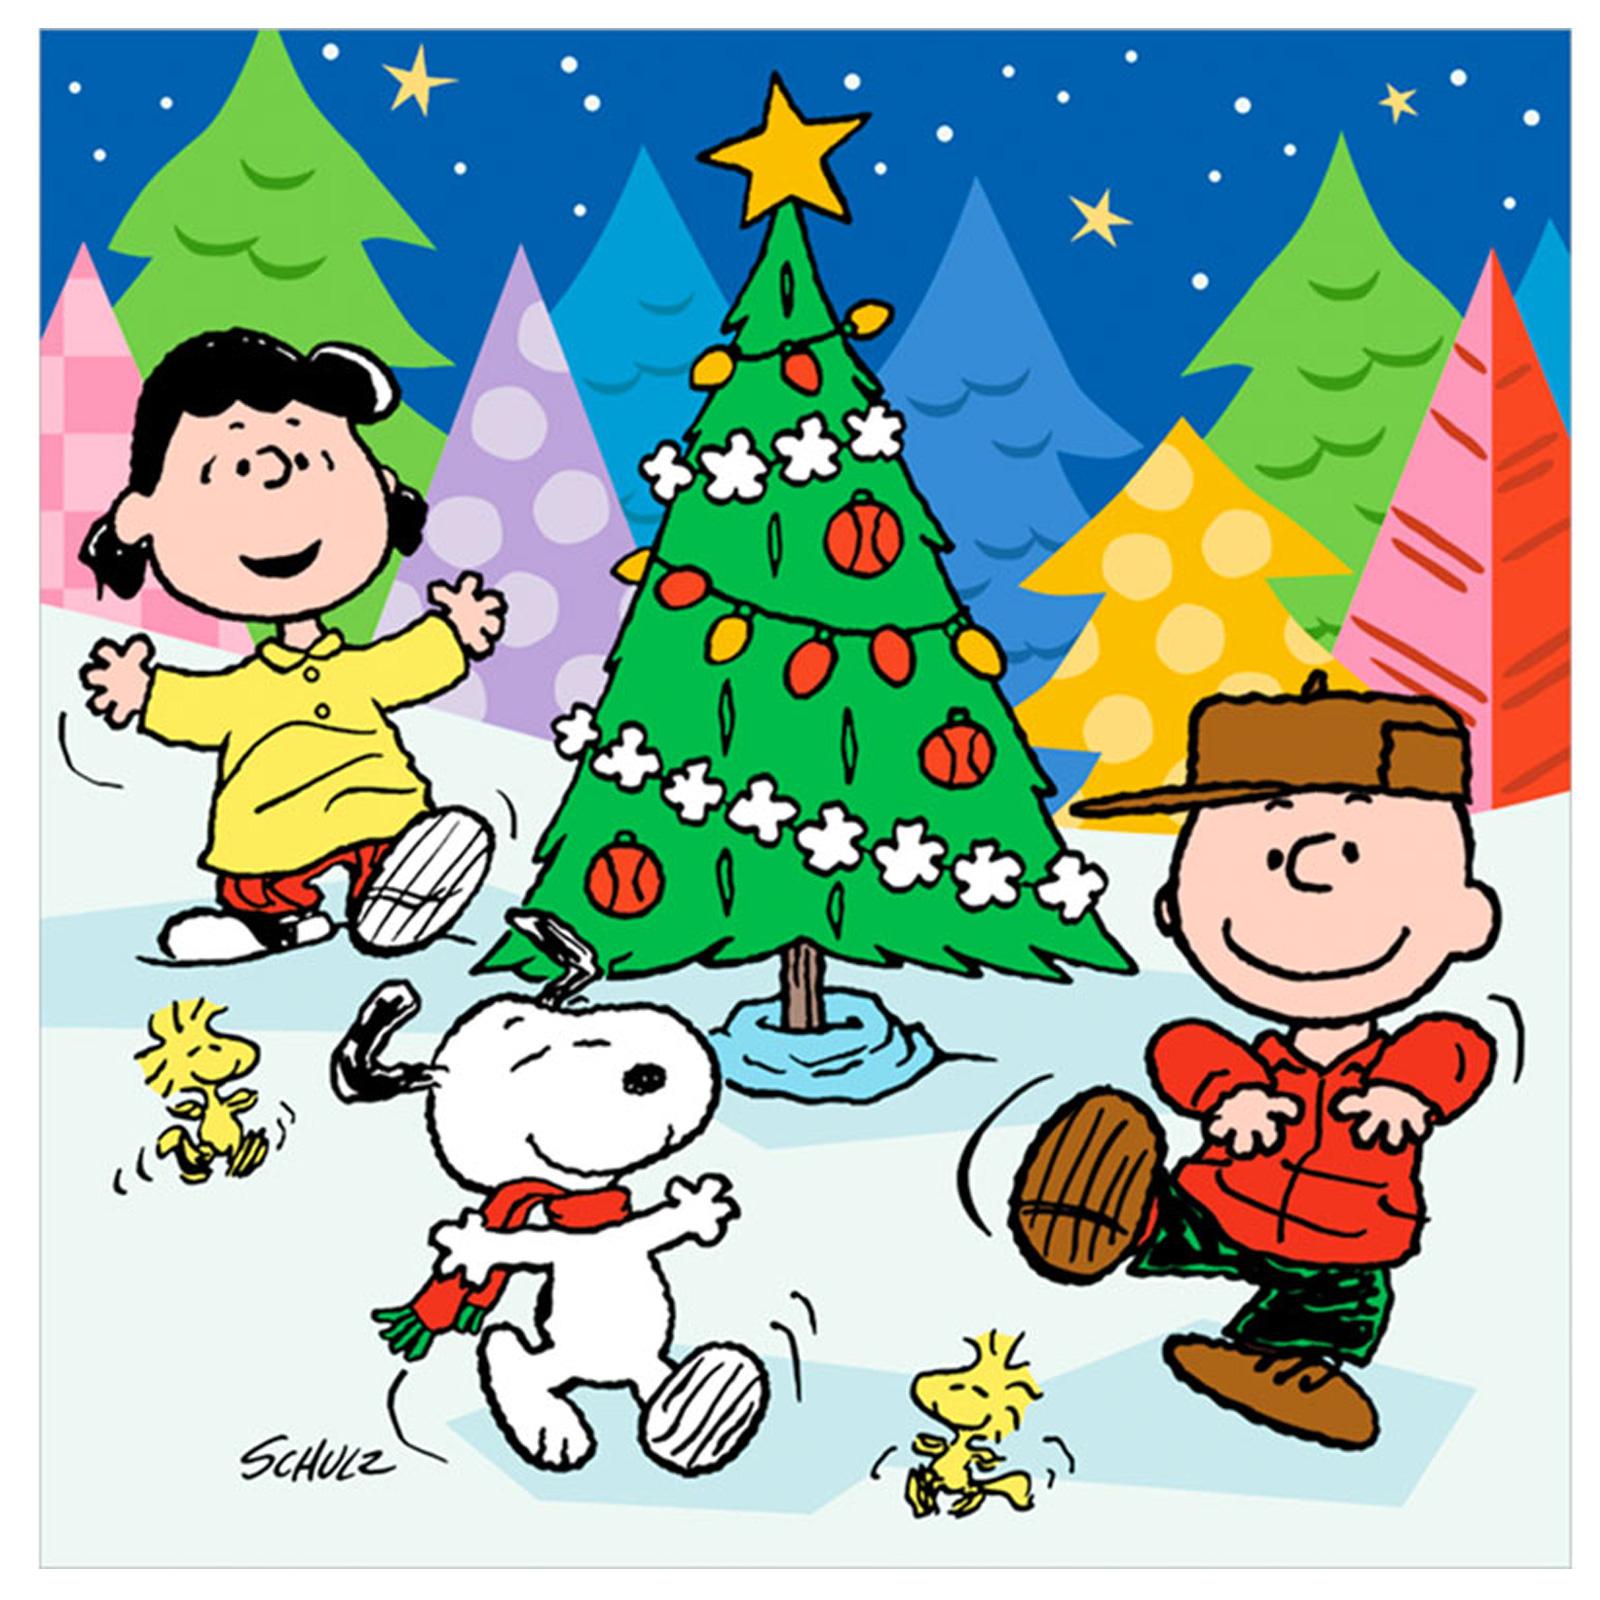 CHARLIE BROWN peanuts comics snoopy christmas f wallpaper 1600x1600 1600x1600